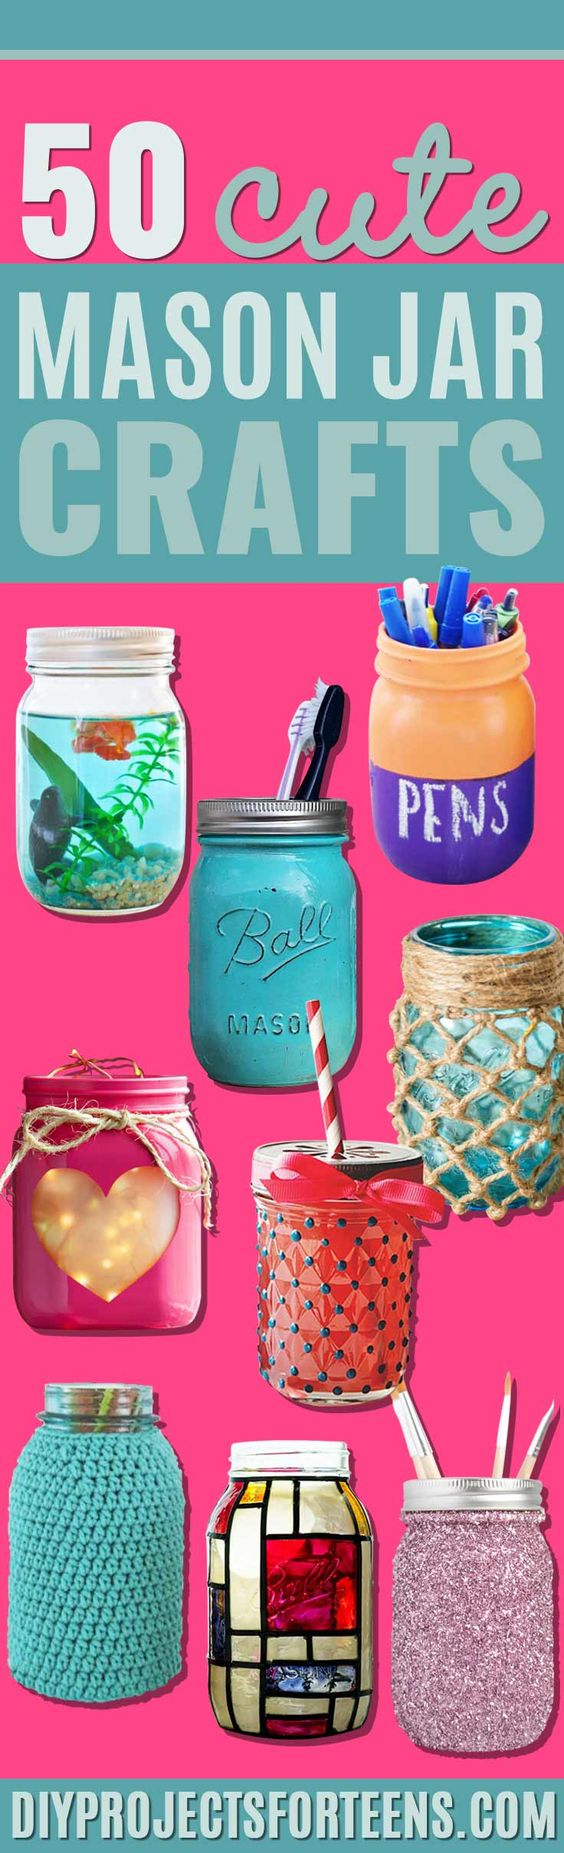 Cute DIY Mason Jar Ideas - Fun Crafts, Creative Room Decor, Homemade Gifts, Creative Home Decor Projects and DIY Mason Jar Lights - Cool Crafts for Teens and Tween Girls http://diyprojectsforteens.com/cute-diy-mason-jar-crafts